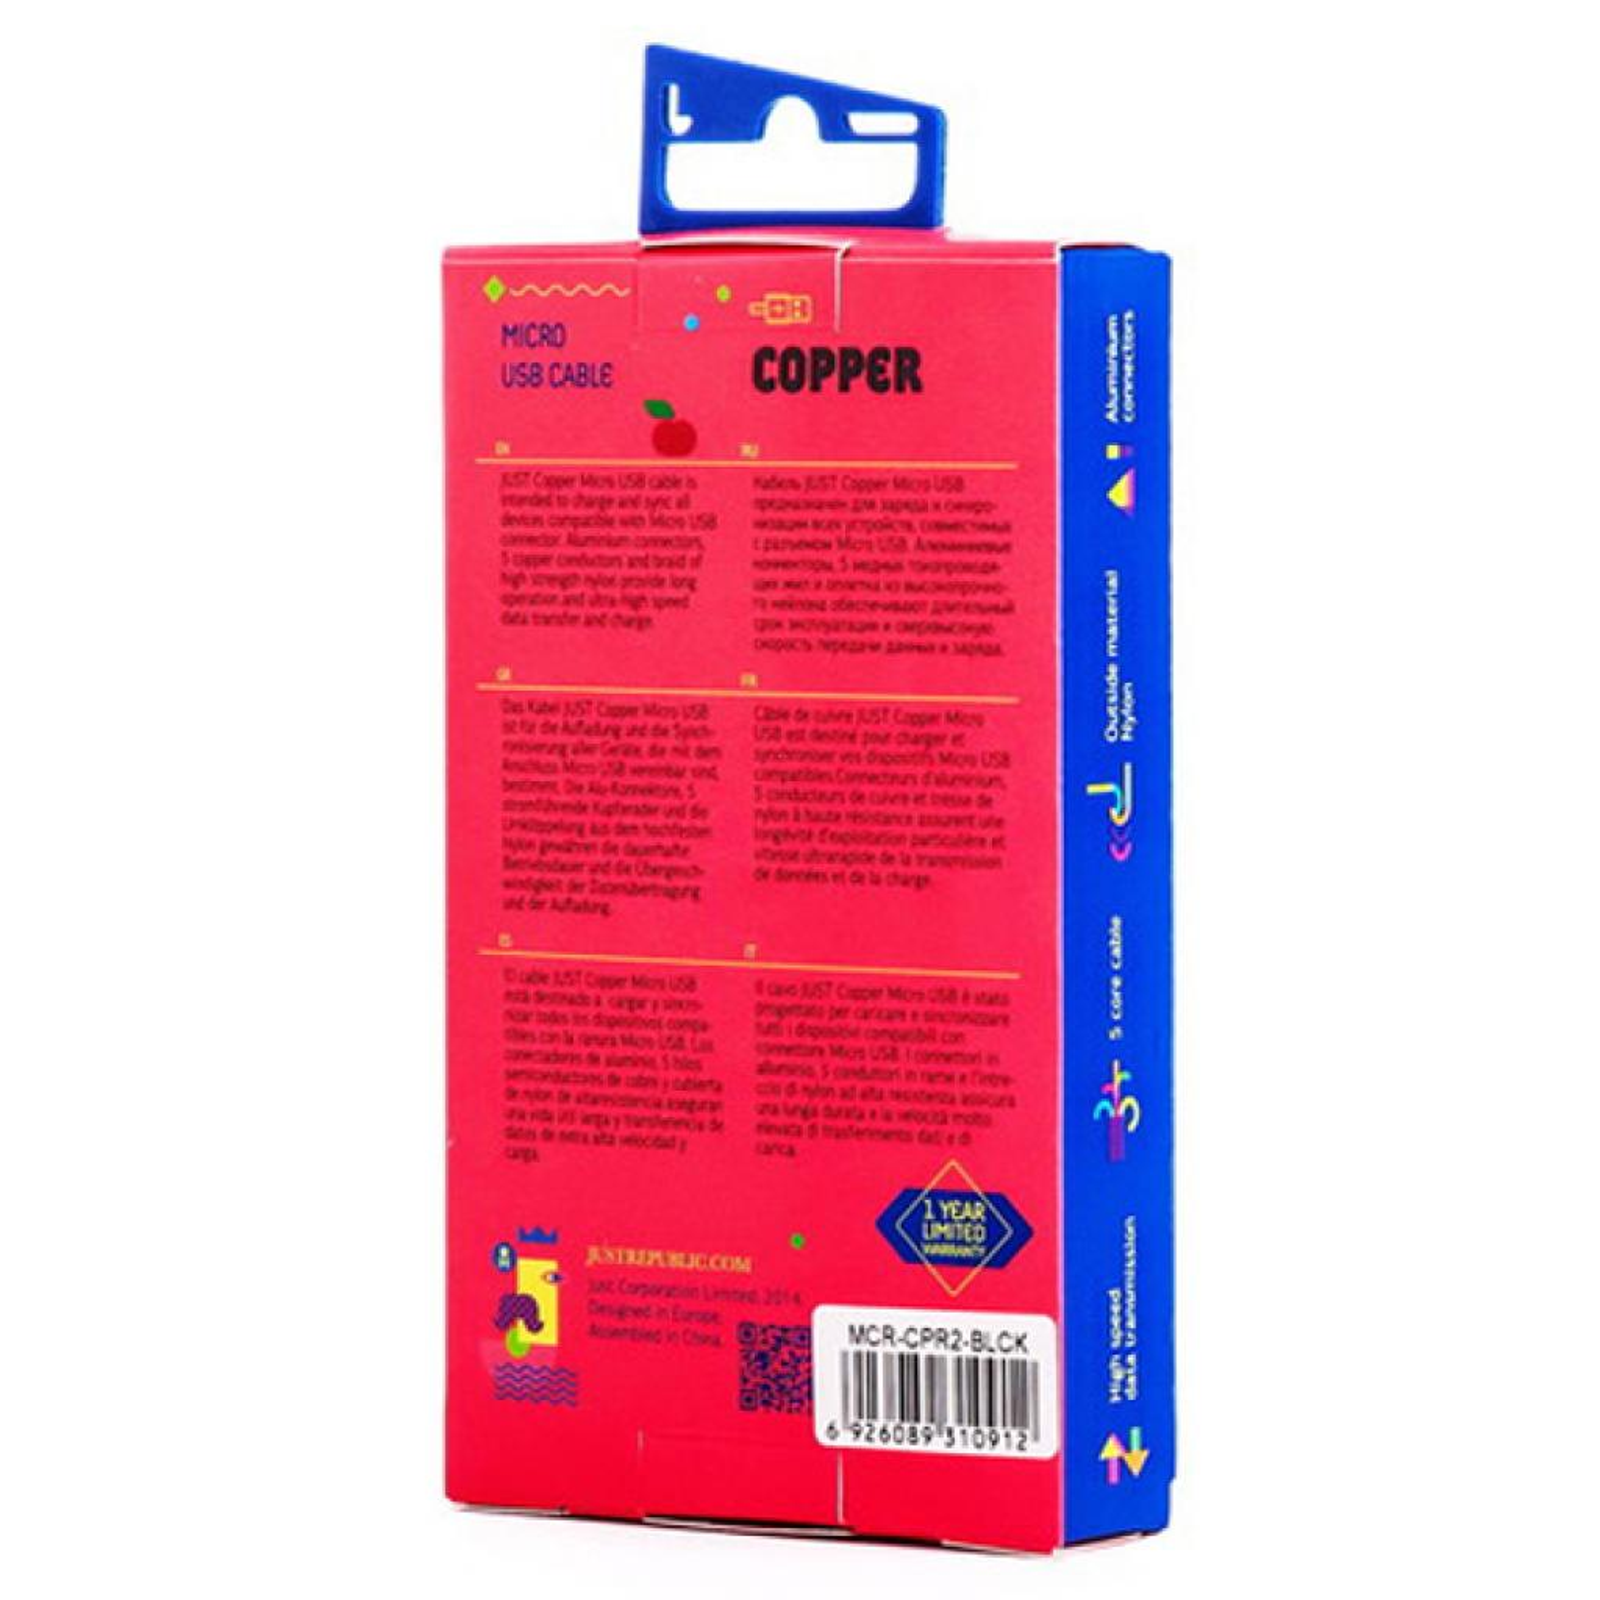 Дата кабель JUST Copper Micro USB Cable 2M Black (MCR-CPR2-BLCK) изображение 5